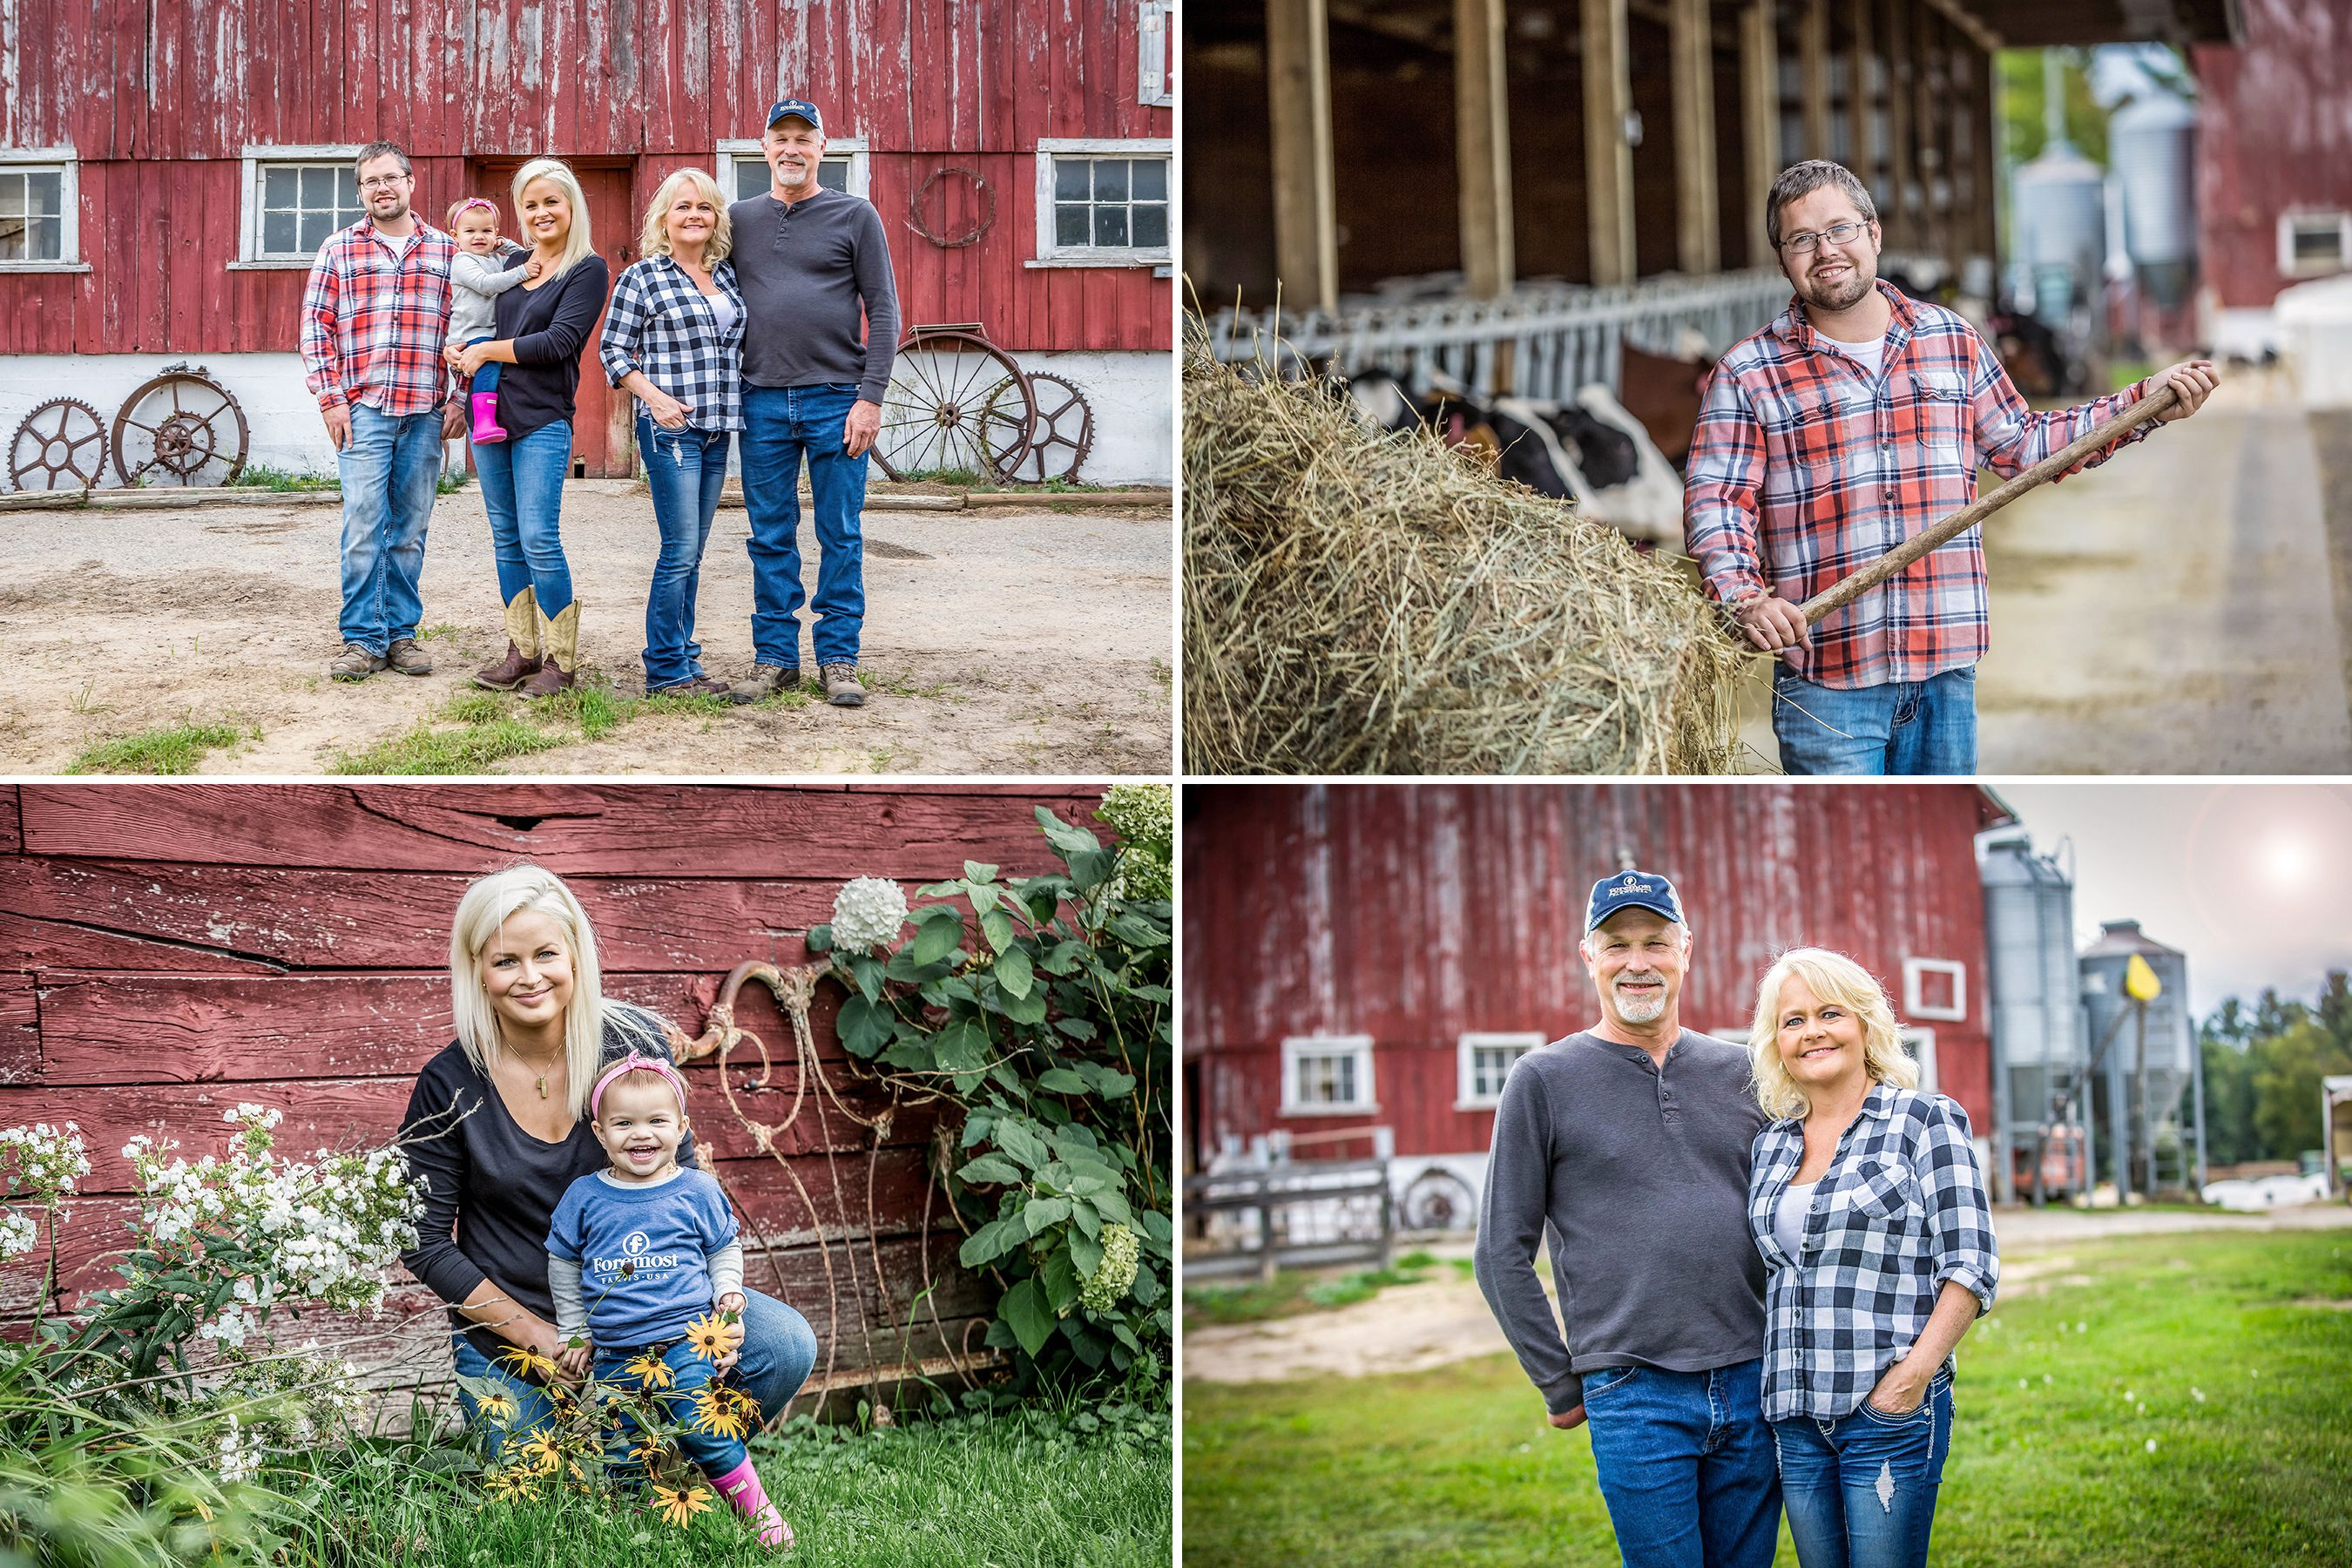 Farm_Family_1_W_F.jpg